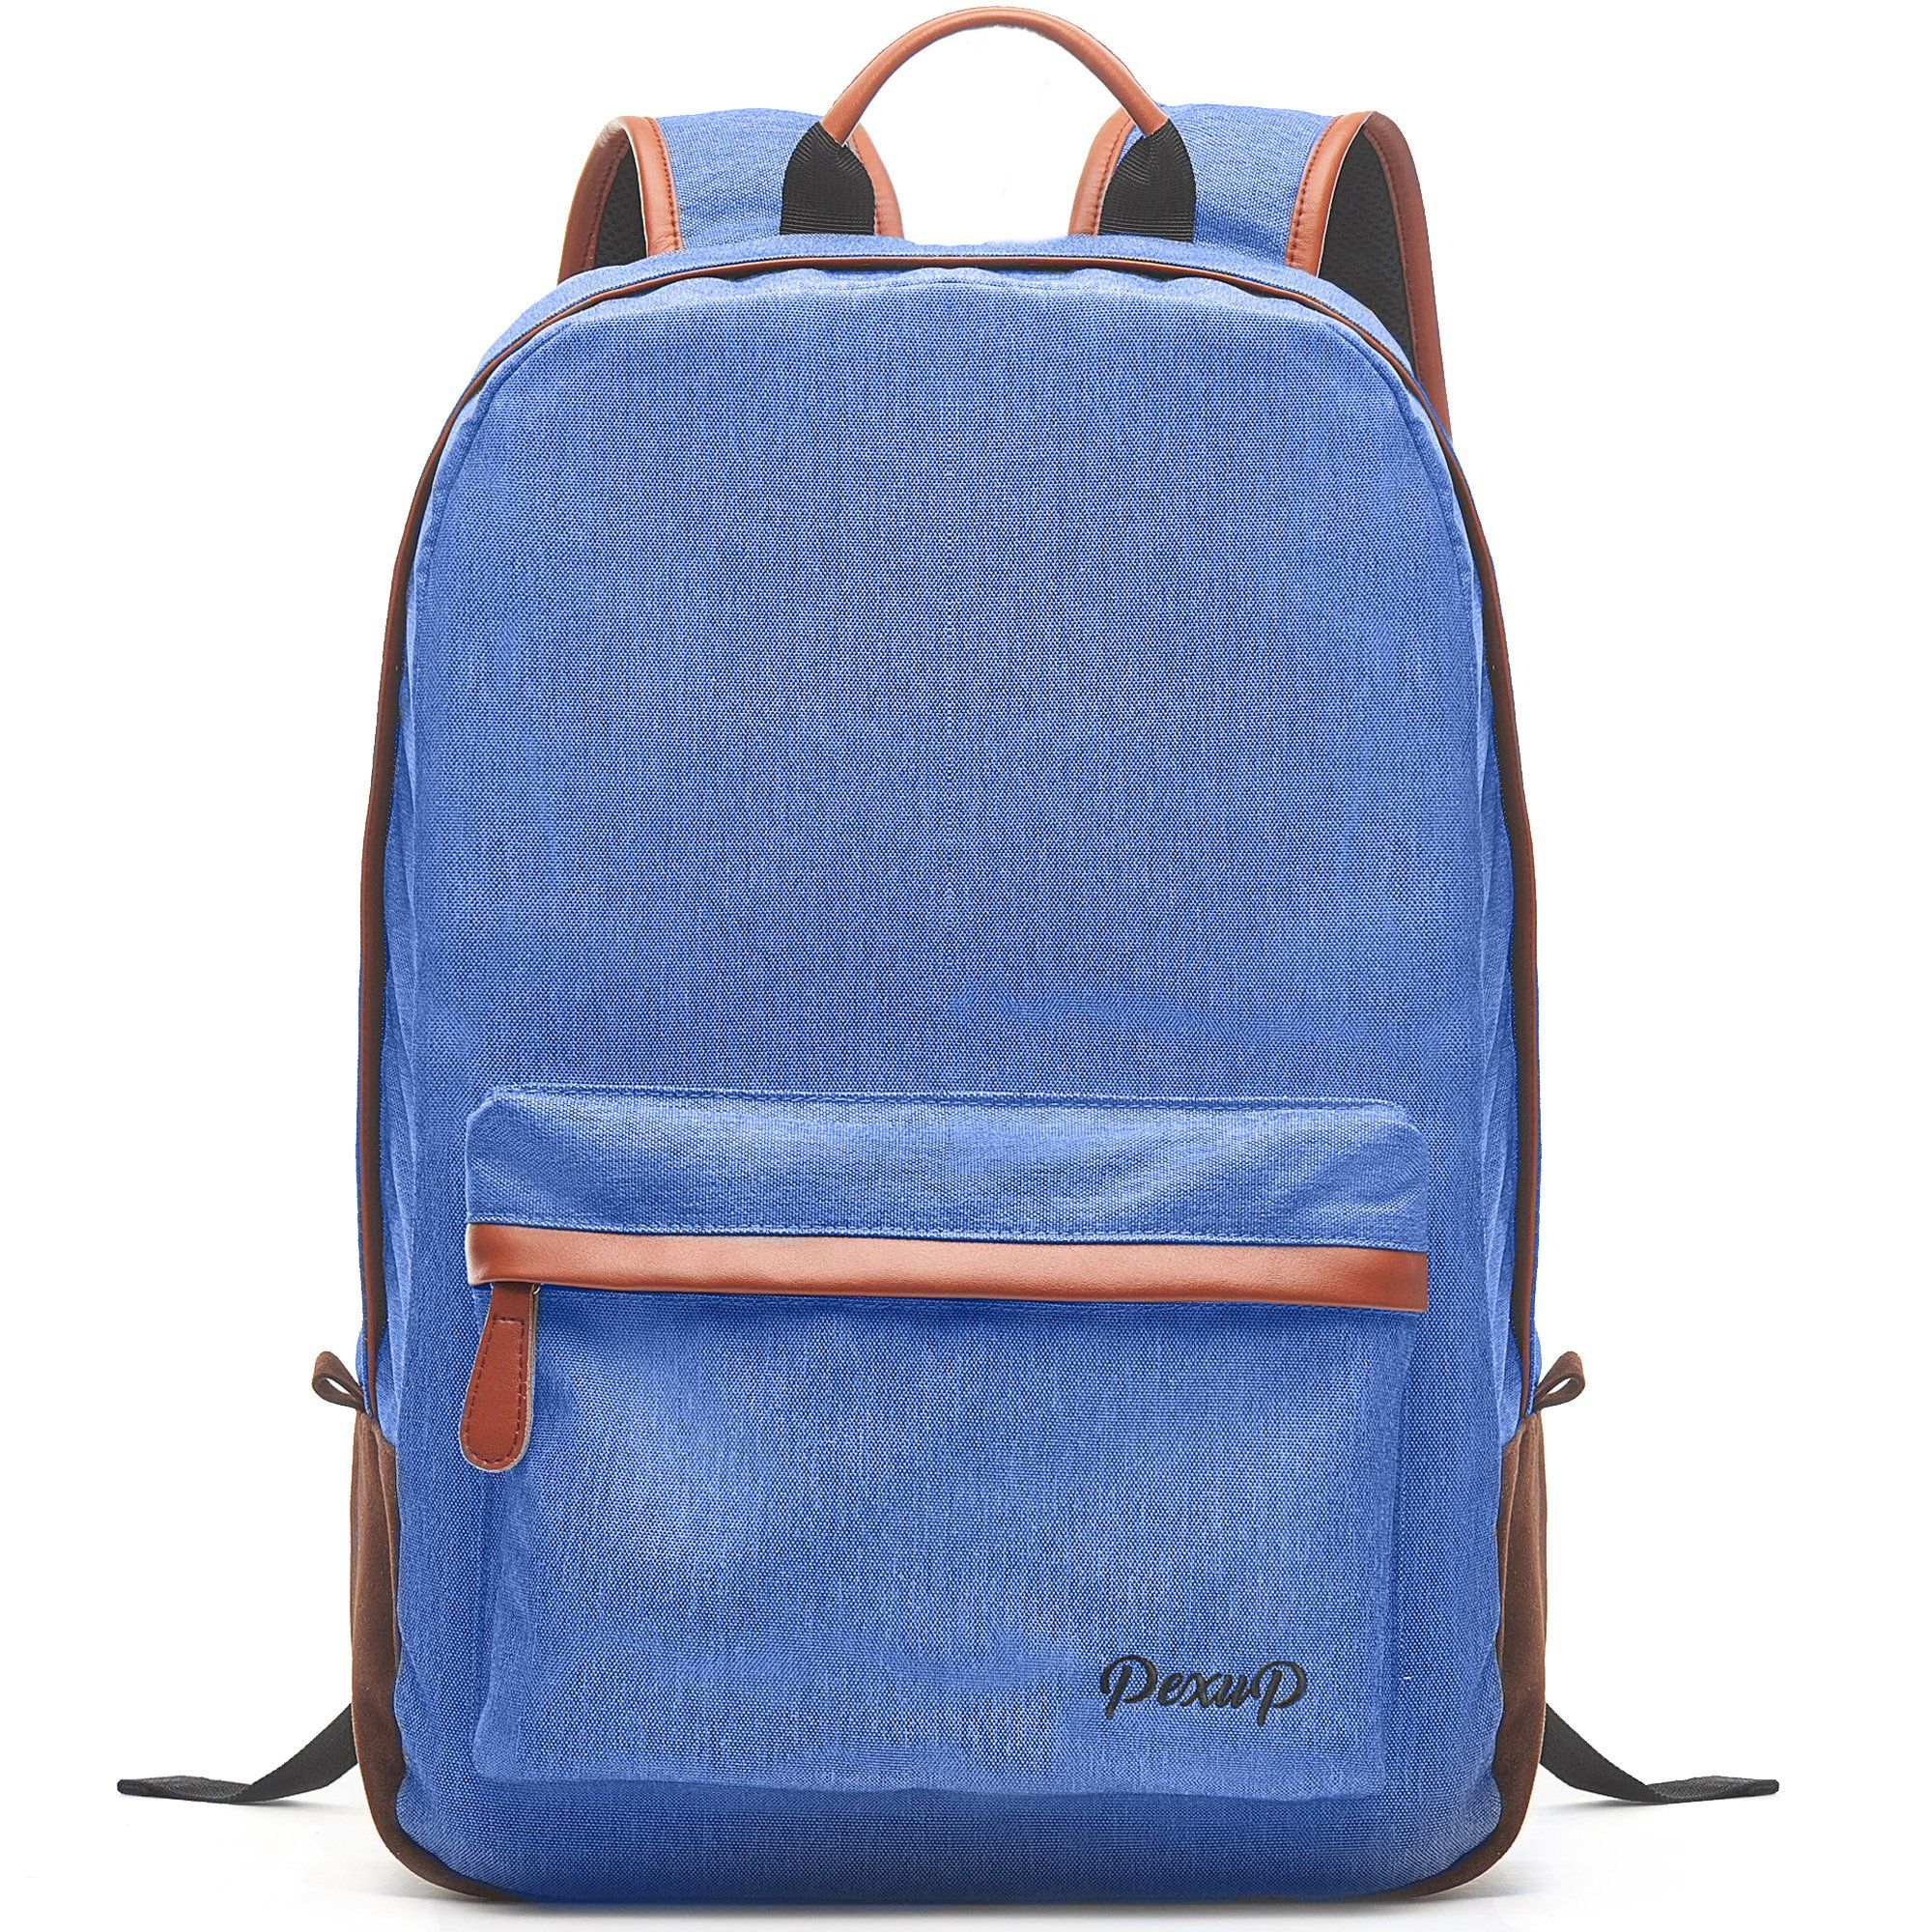 f89d3e4f22 School College Laptop Waterproof Backpack - Women   Men Rucksack Bookbag  Daypack